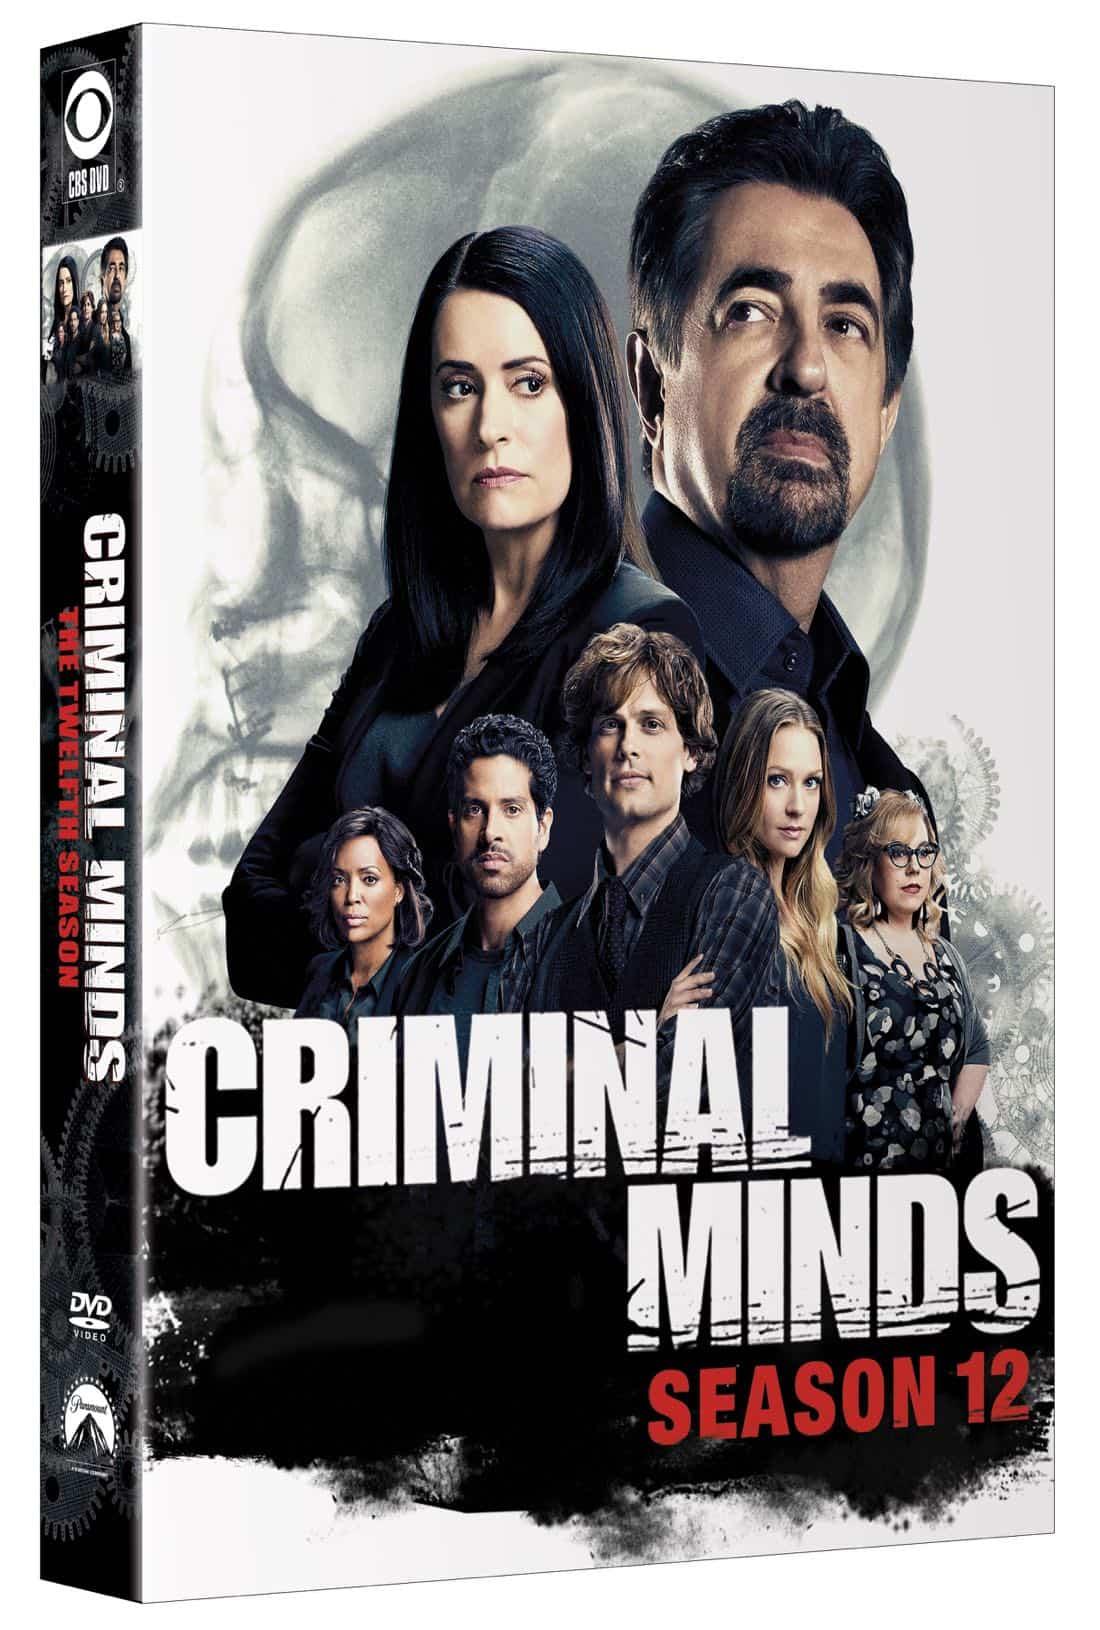 CRIMINAL-MINDS-Season-12-DVD-Cover